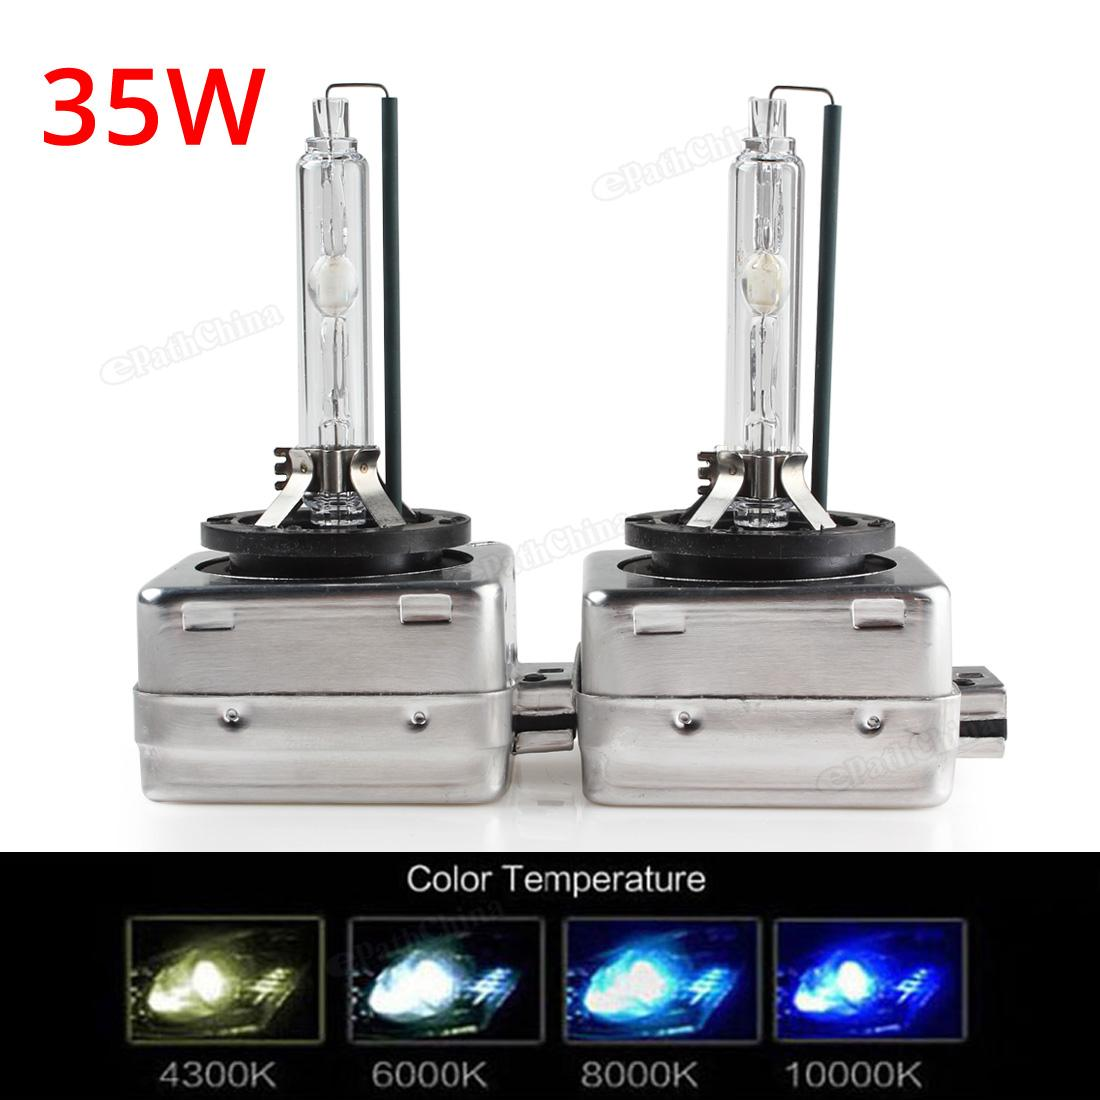 D3S D3C 2pcs 35W HID Xenon Headlight 12V Car Headlight Bulb Replacement Lamp Colors 4300K 6000K